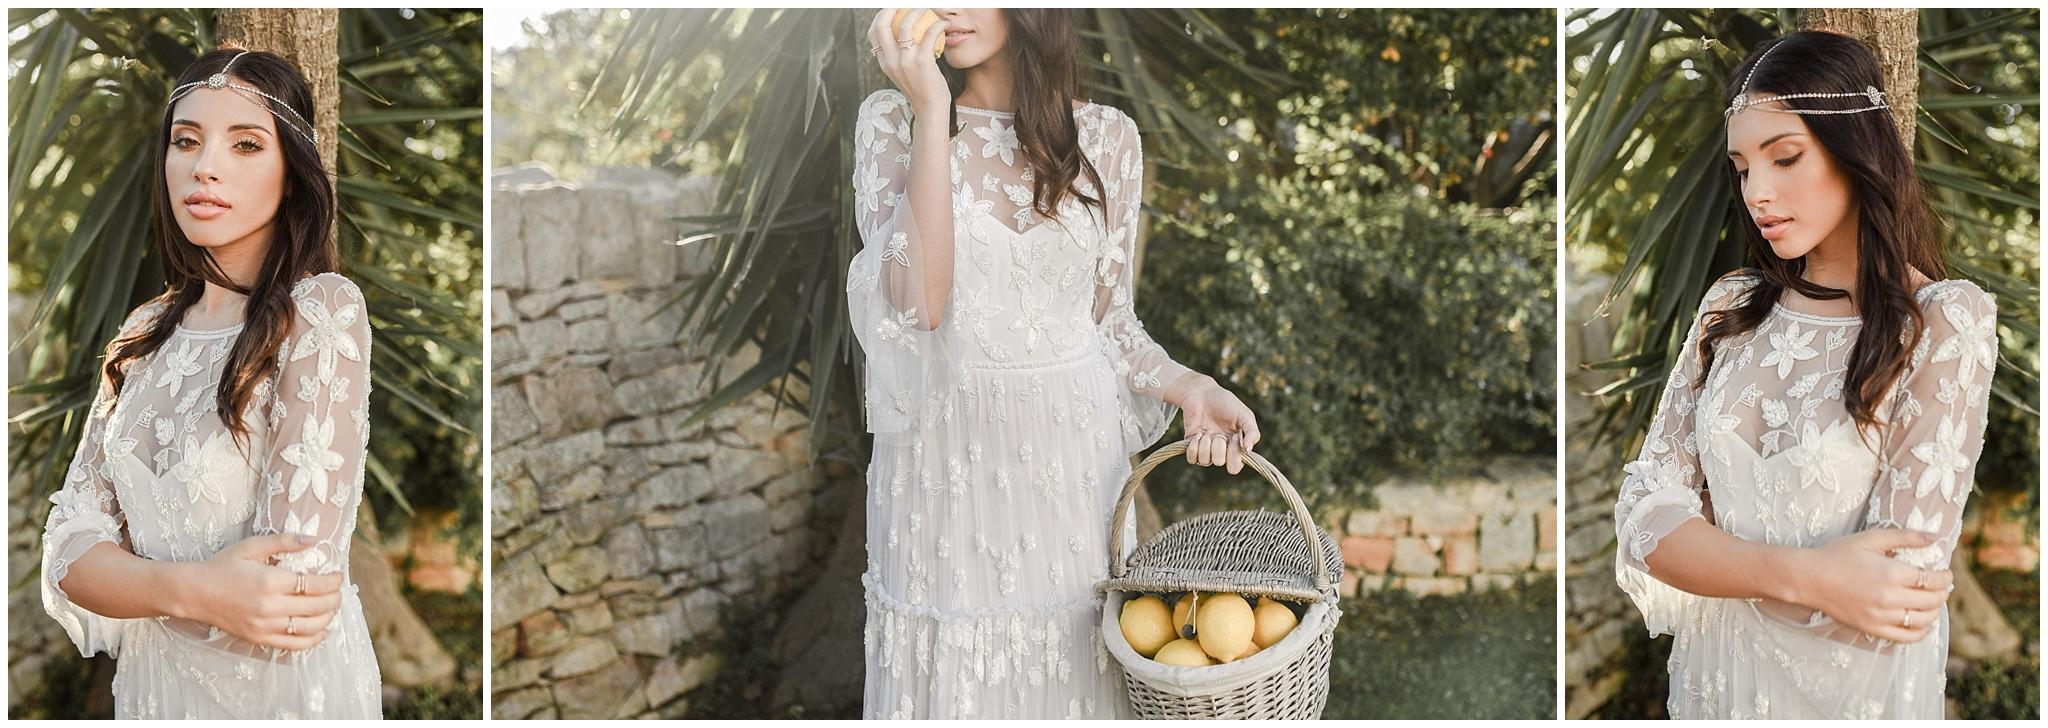 Puglia-Tara-Florence-Bridal-Editorial-160_WEB.jpg